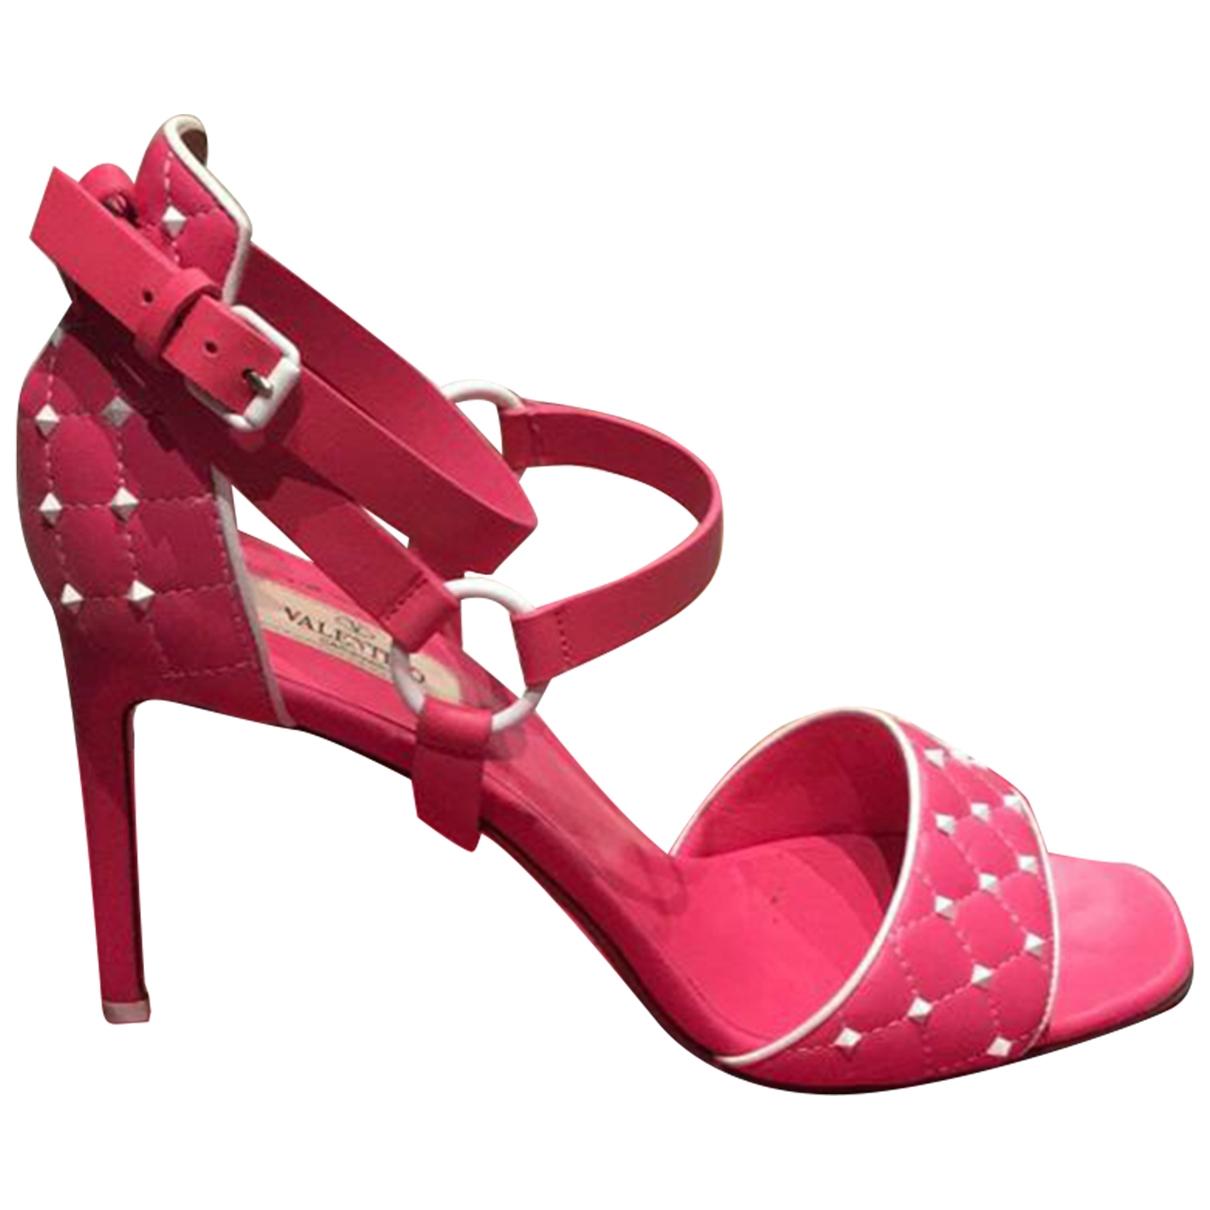 Valentino Garavani Rockstud Spike Pink Leather Sandals for Women 40.5 EU